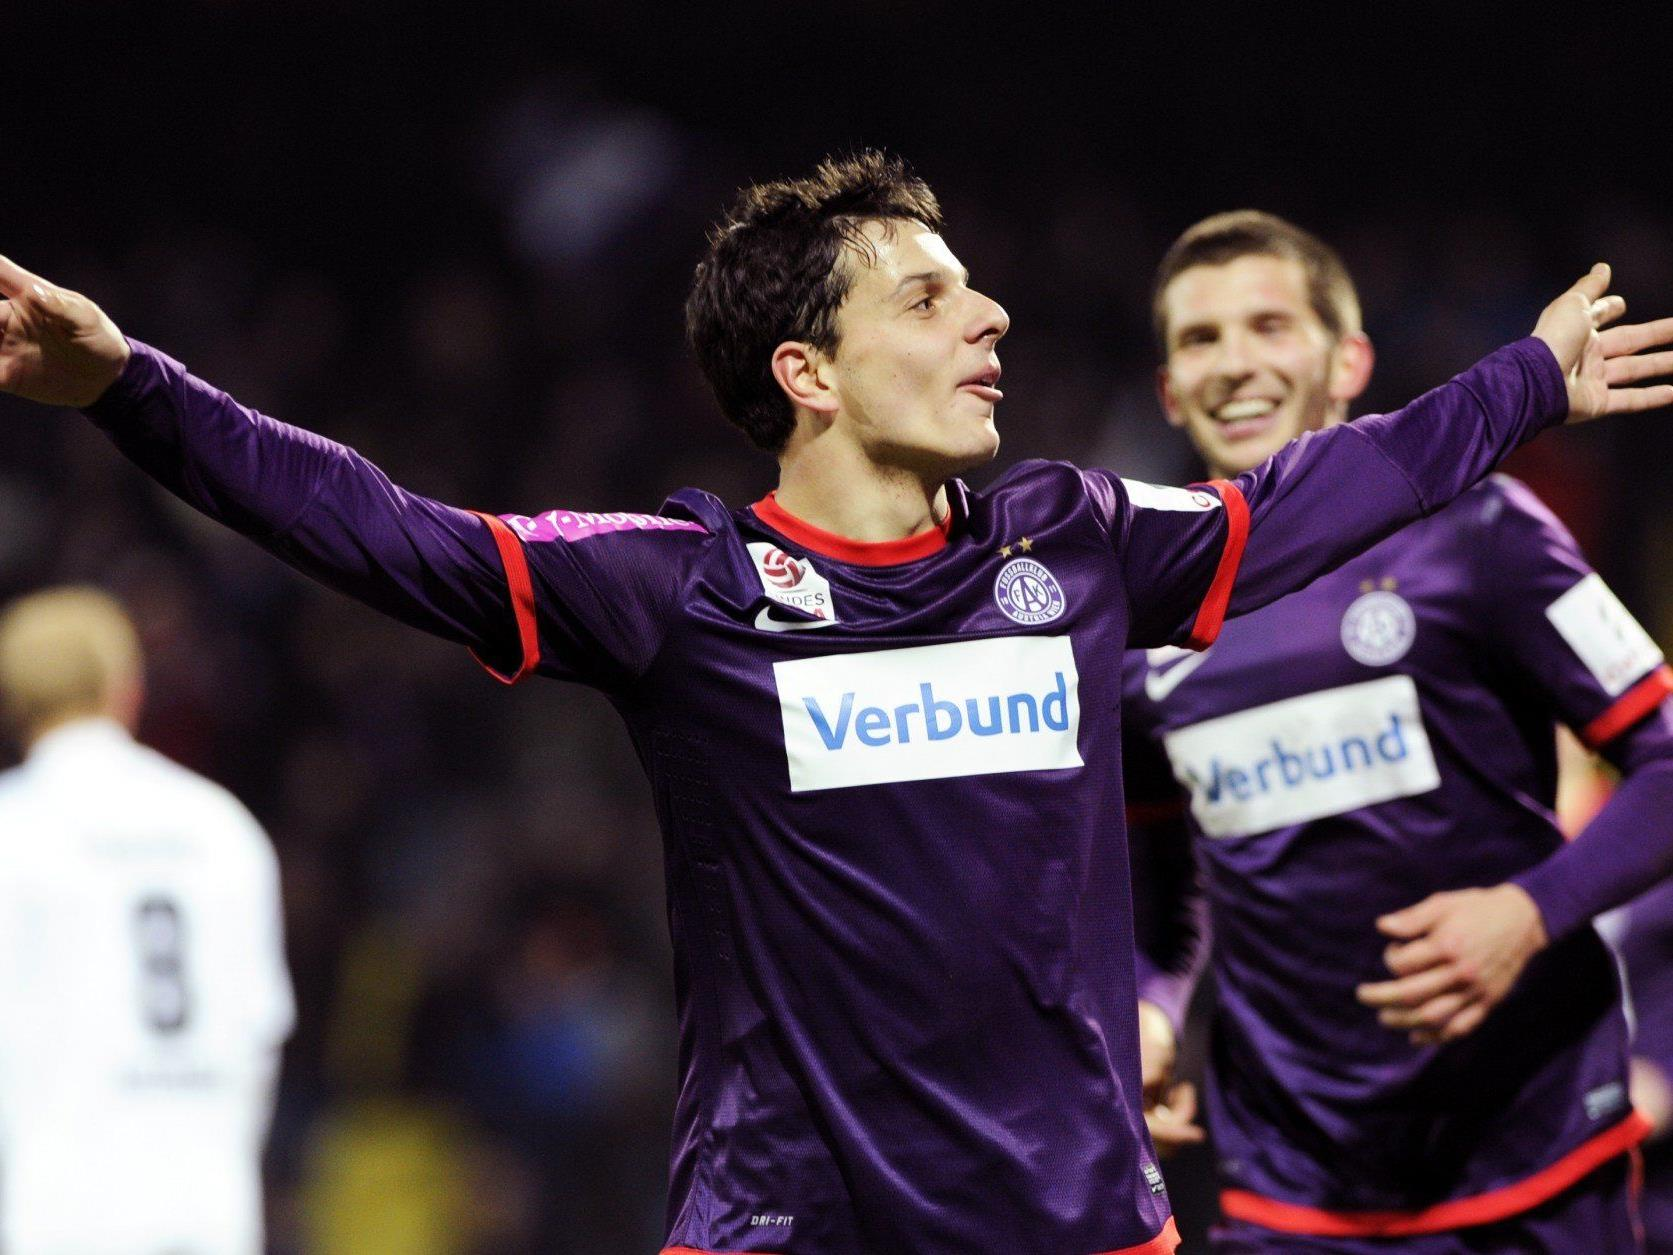 Fußball: Austria - Wacker Innsbruck 3 - Hosiner-Doppelpack bei 4:0